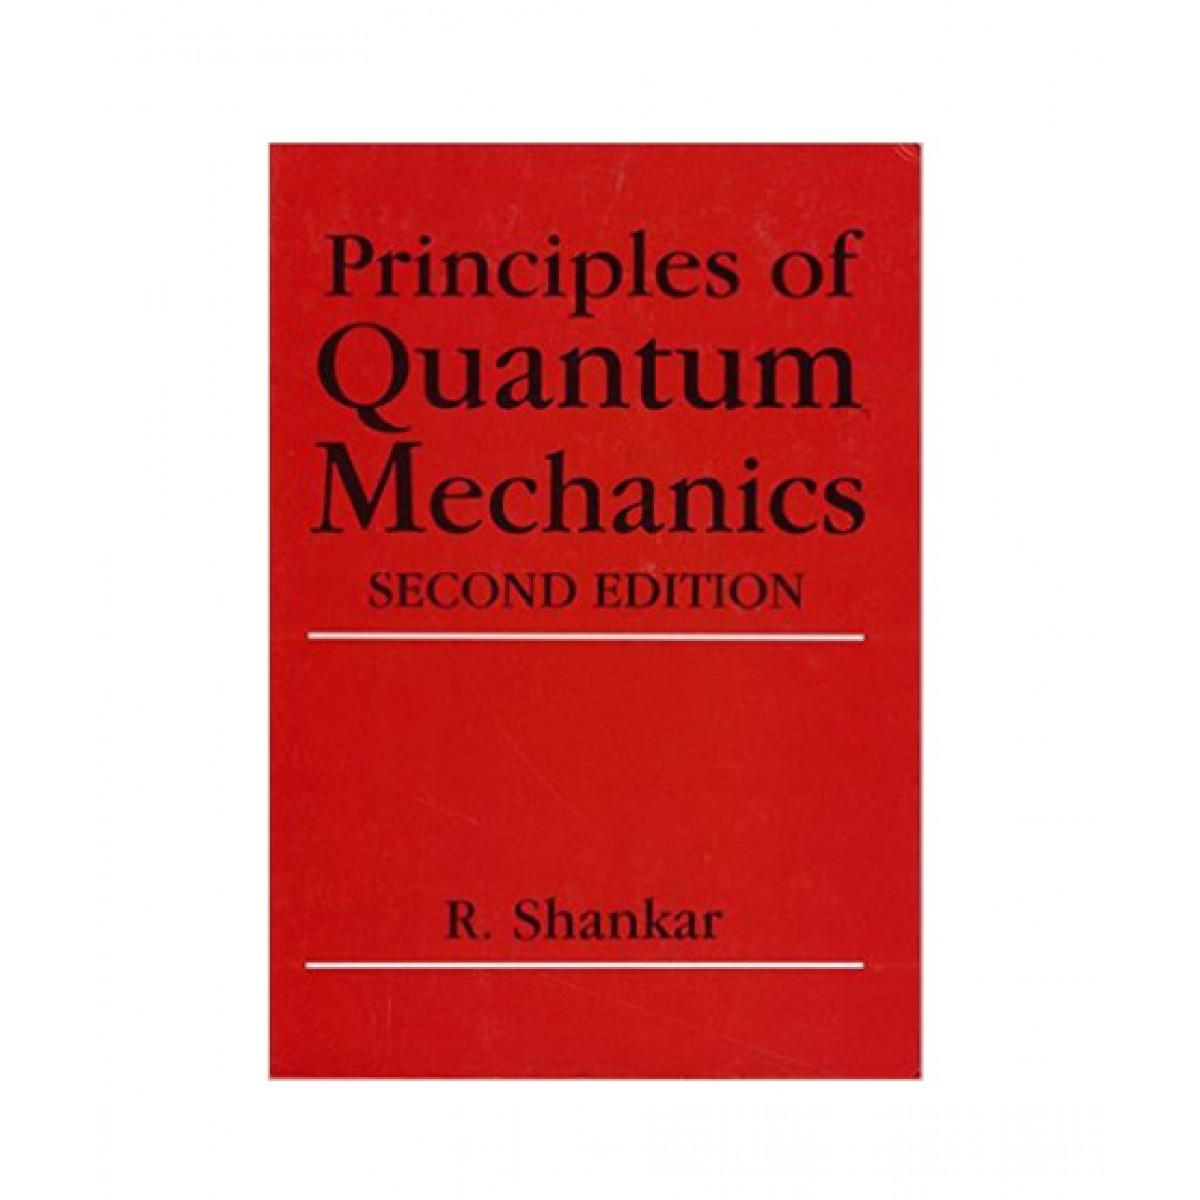 Principles of Quantum Mechanics, (Second Edition)